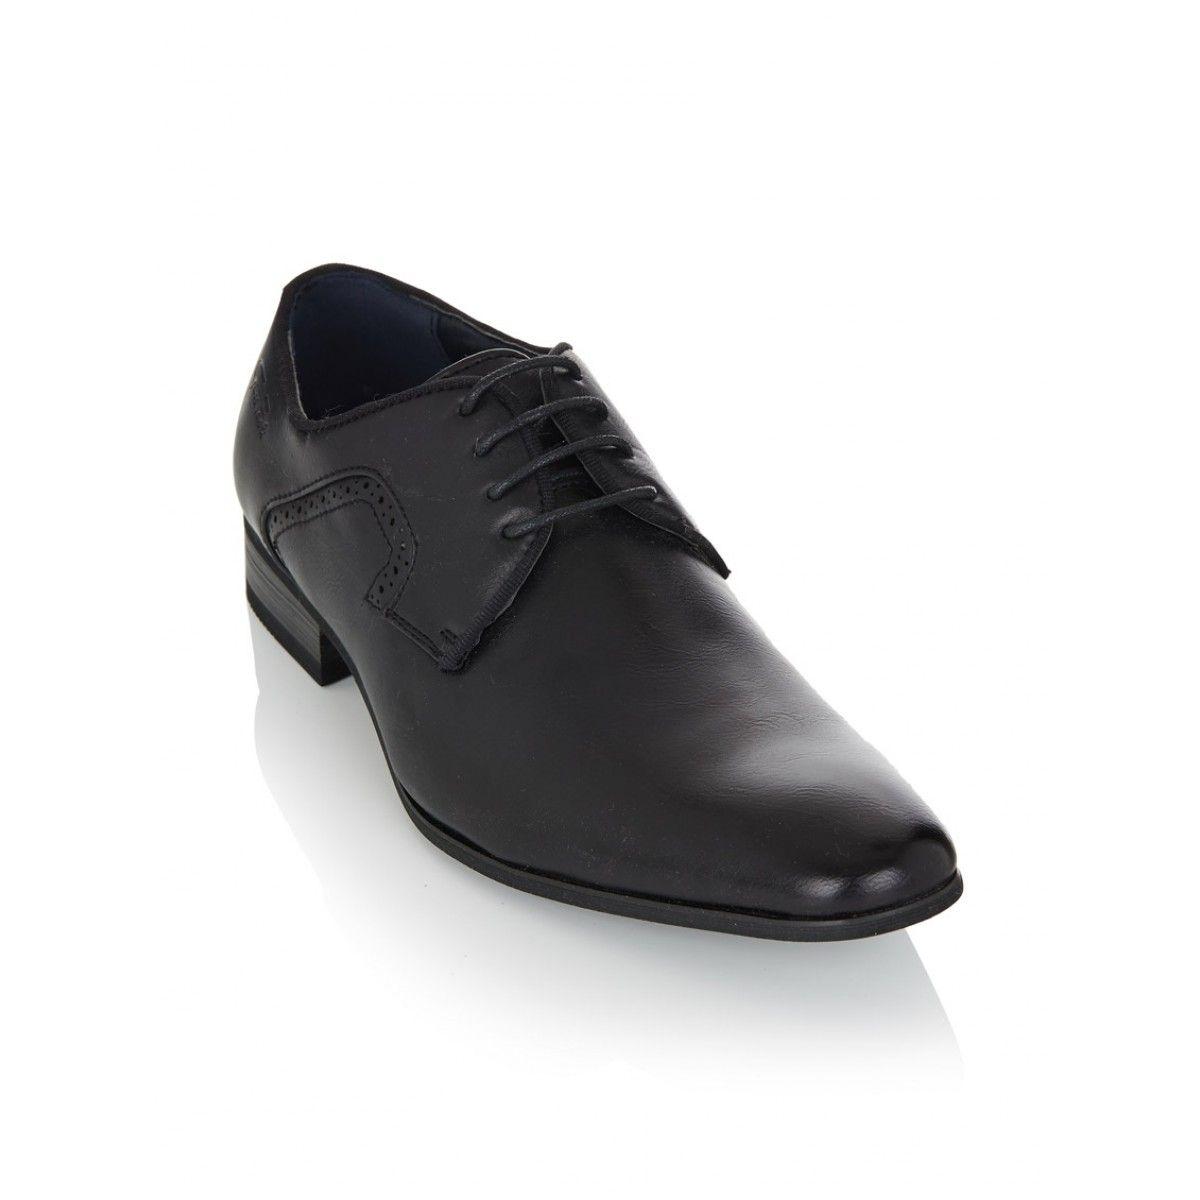 Look What I Found On Superbalist Com Lace Up Shoes Black Shoes Dress Shoes Men [ 1200 x 1200 Pixel ]